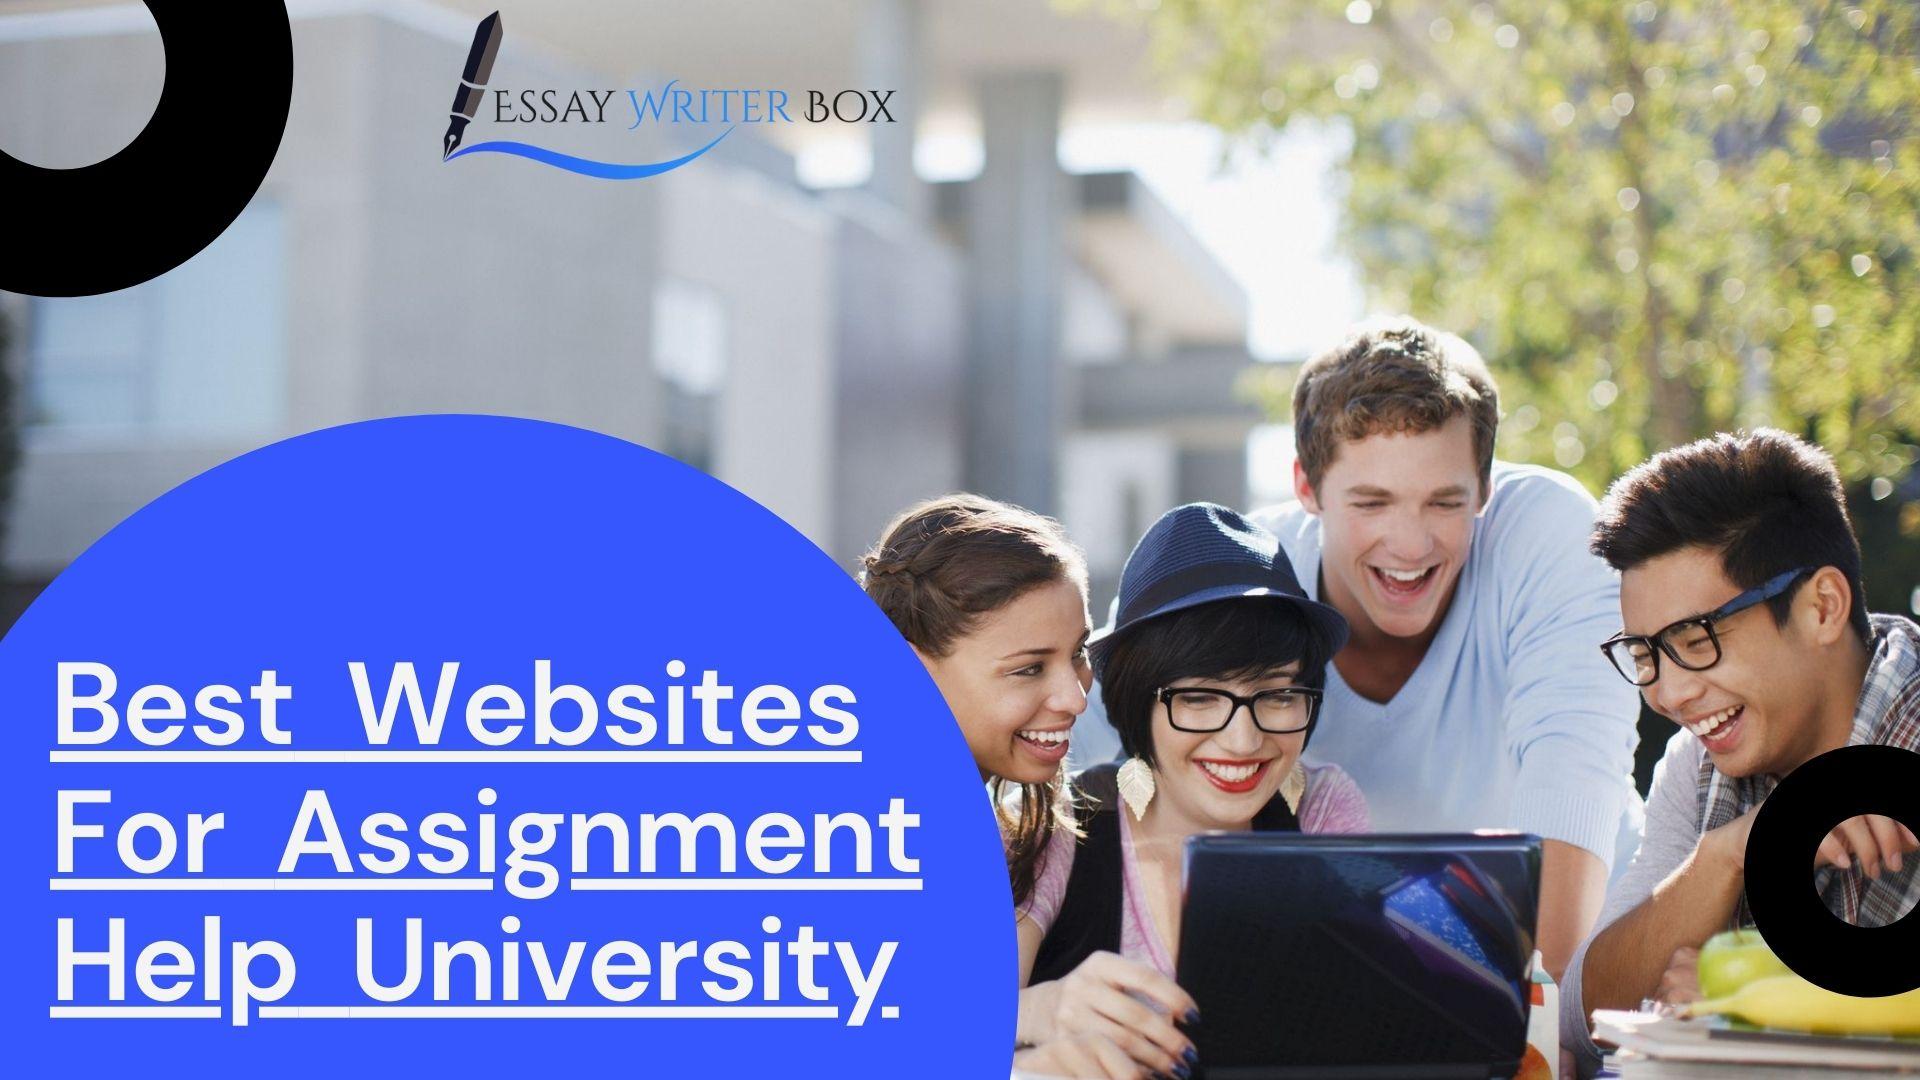 Assignment Help University